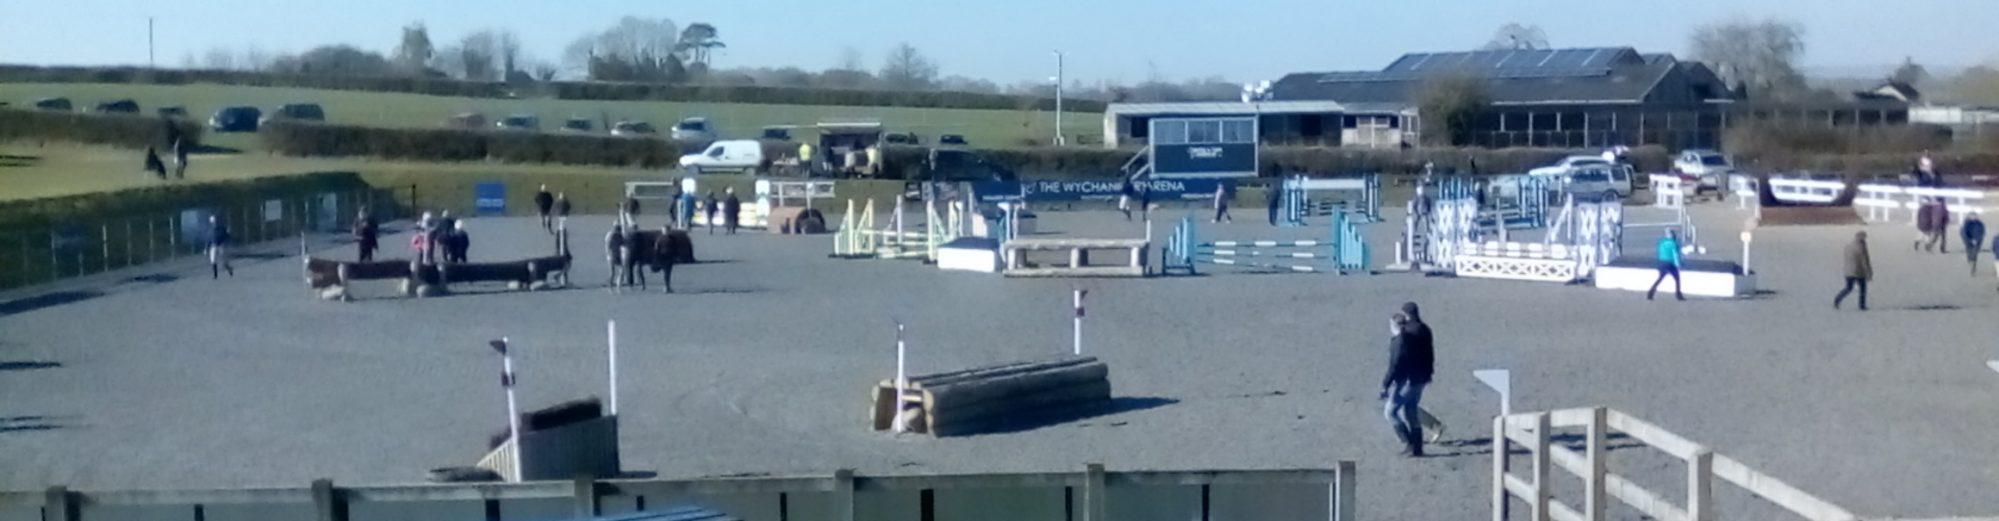 British Riding Clubs Area 12